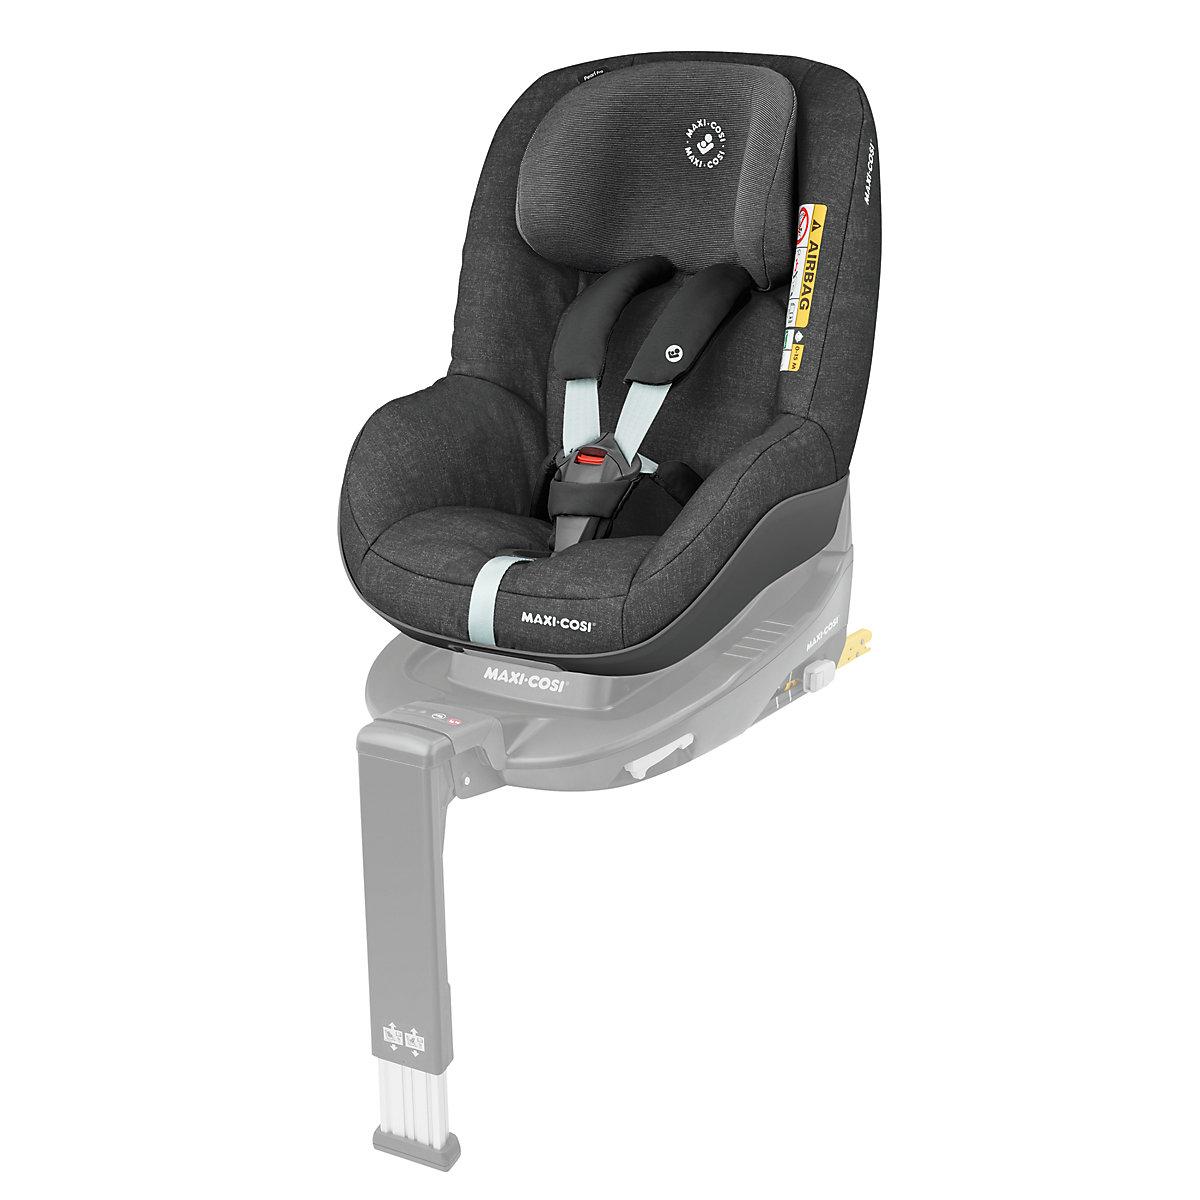 Maxi-Cosi pearl pro i-size nomad black combination car seat